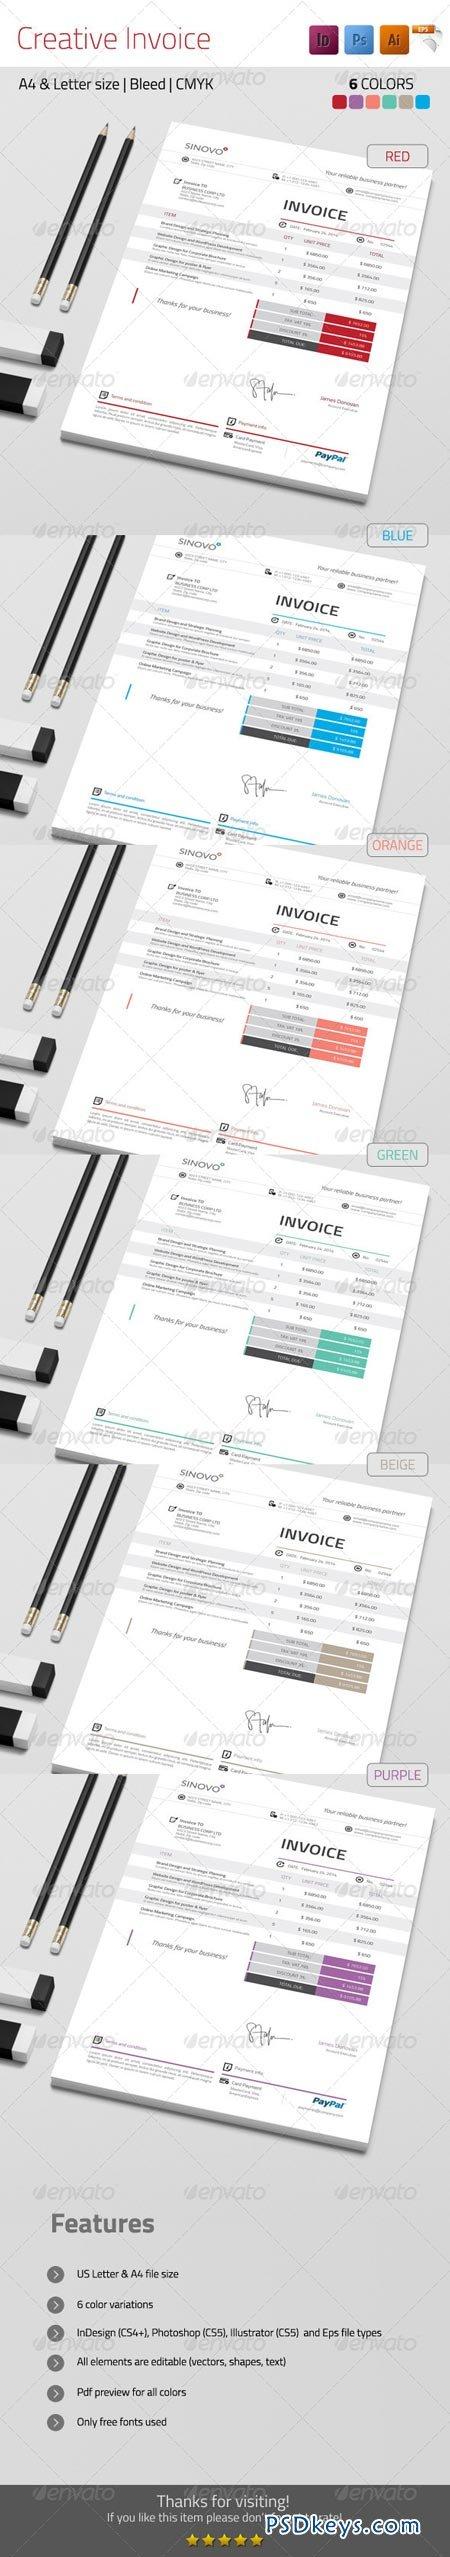 Creative Invoice 7225899